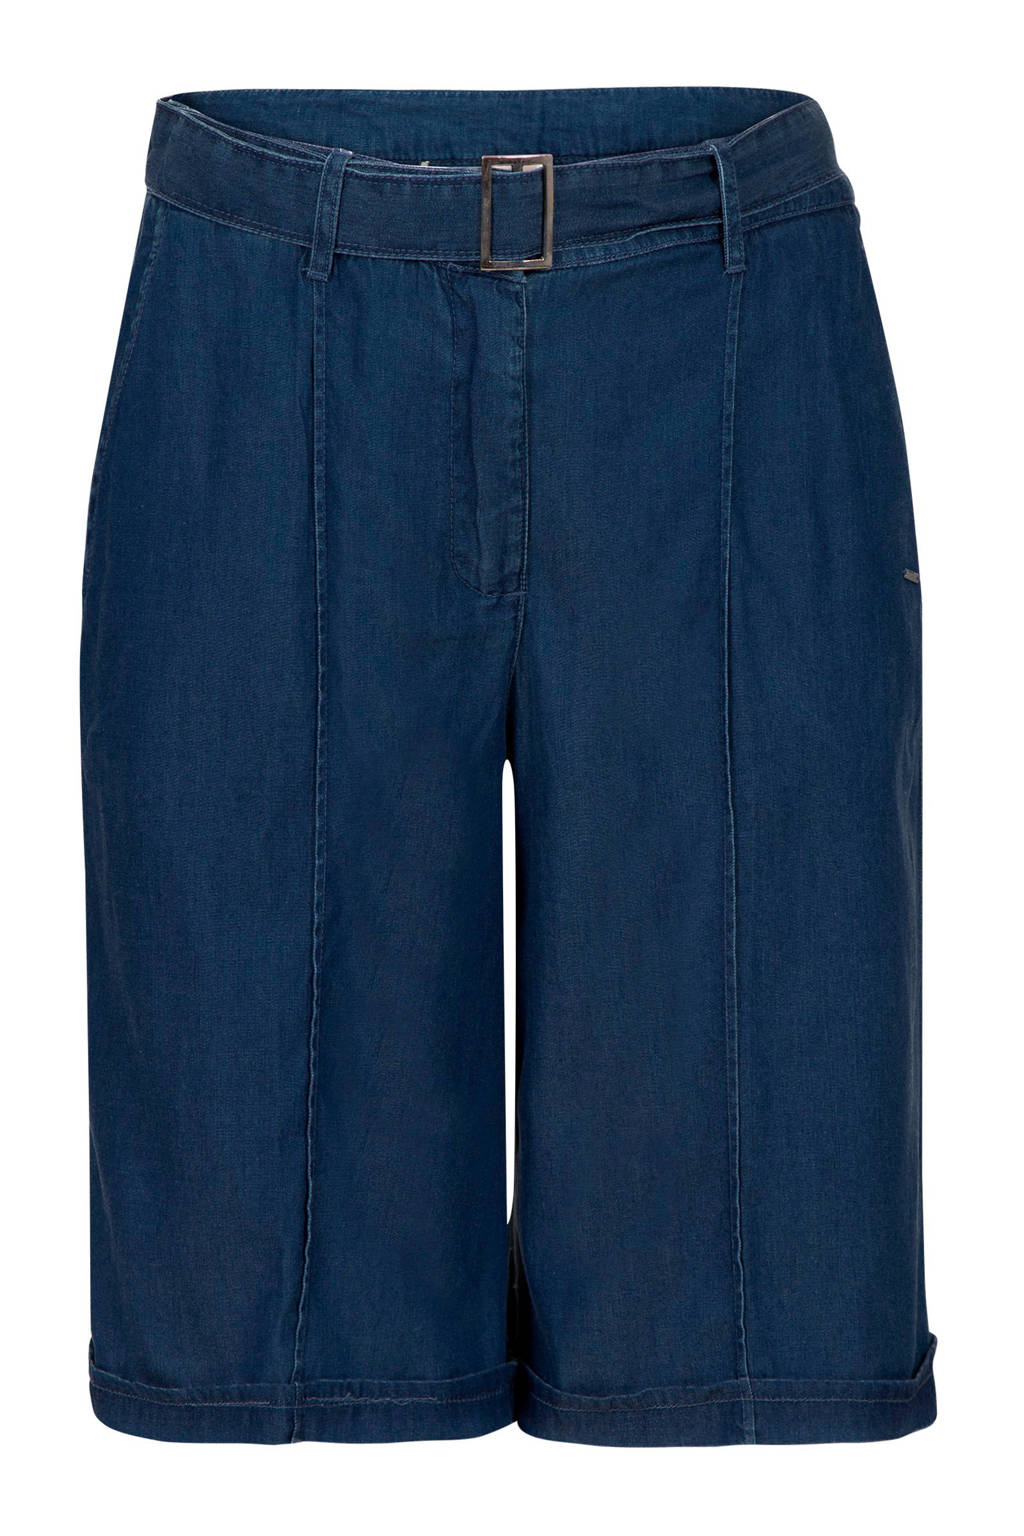 Promiss loose fit jeans short, Dark denim